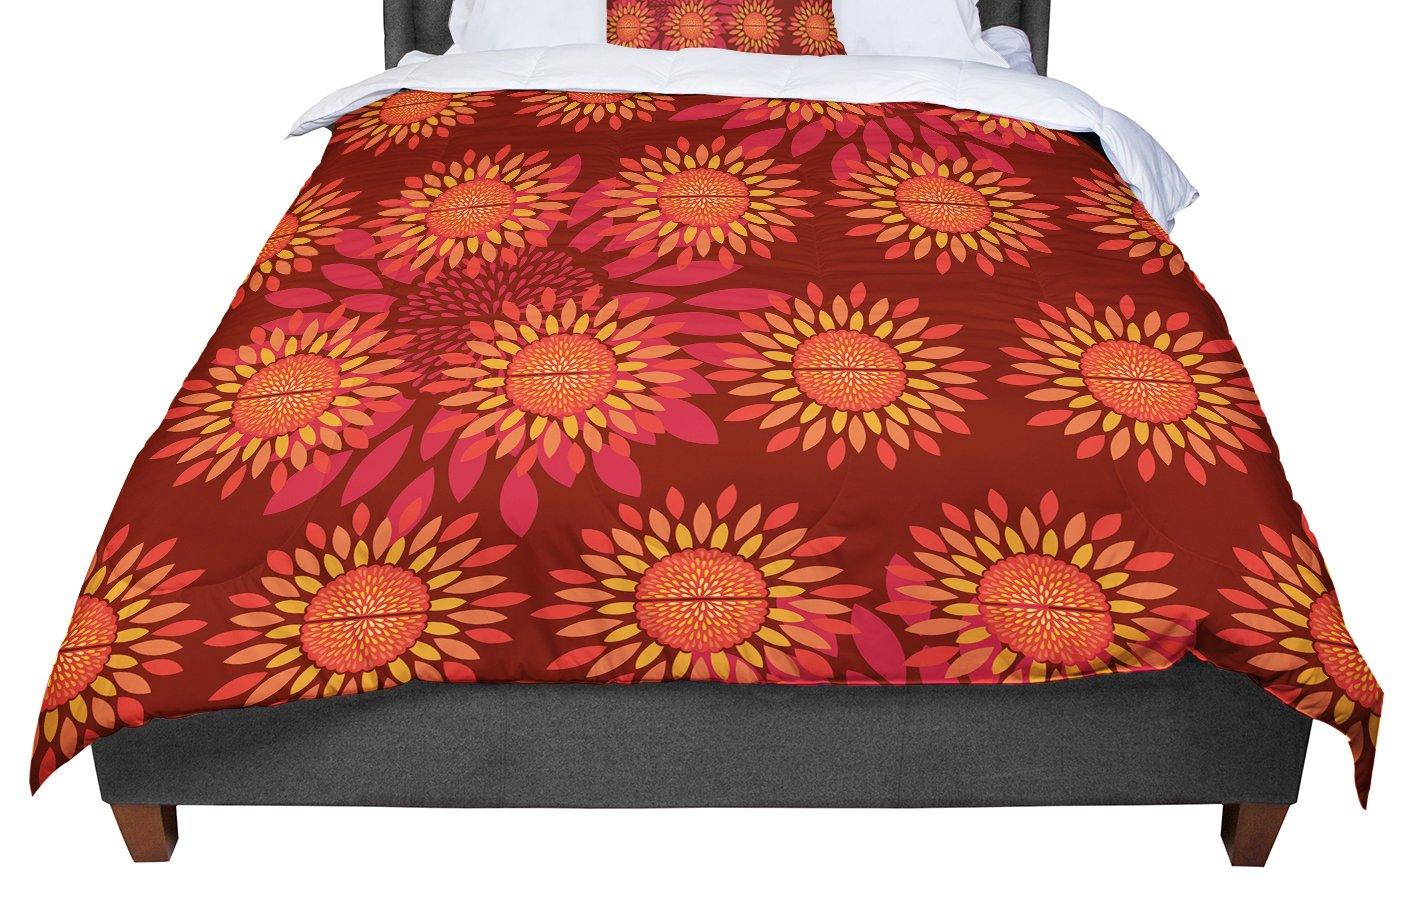 104 X 88 KESS InHouse Miranda Mol Orange on Black Tile King Cal King Comforter